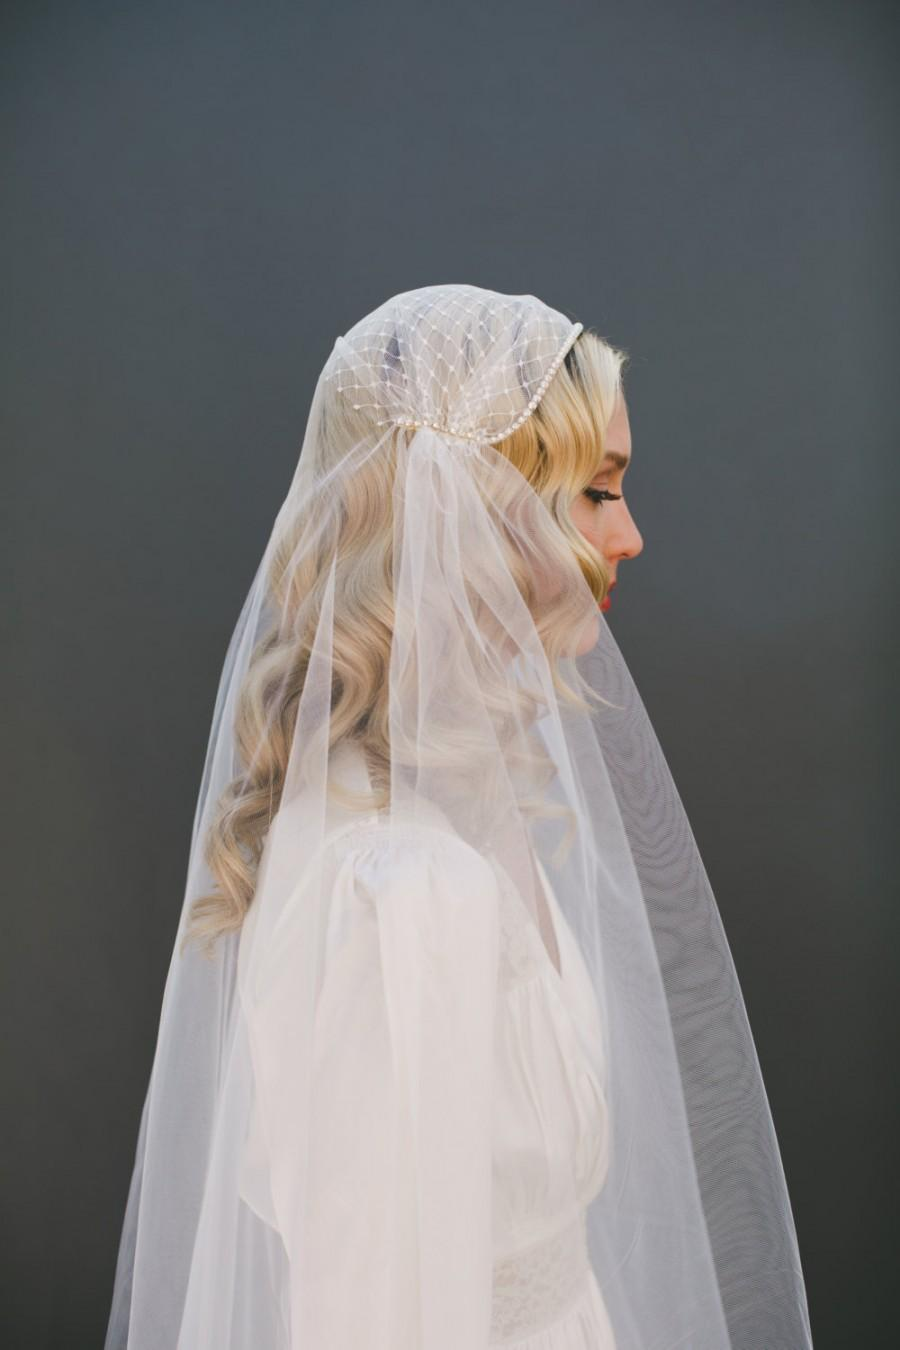 Hochzeit - GOLD Juliet Cap Veil, Russian Net Veil Crystal Edge Veil, Ivory Tulle Veil Gatsby BOHO Veil Bohemian Veil Waltz Length Veil, Long Veil #1208